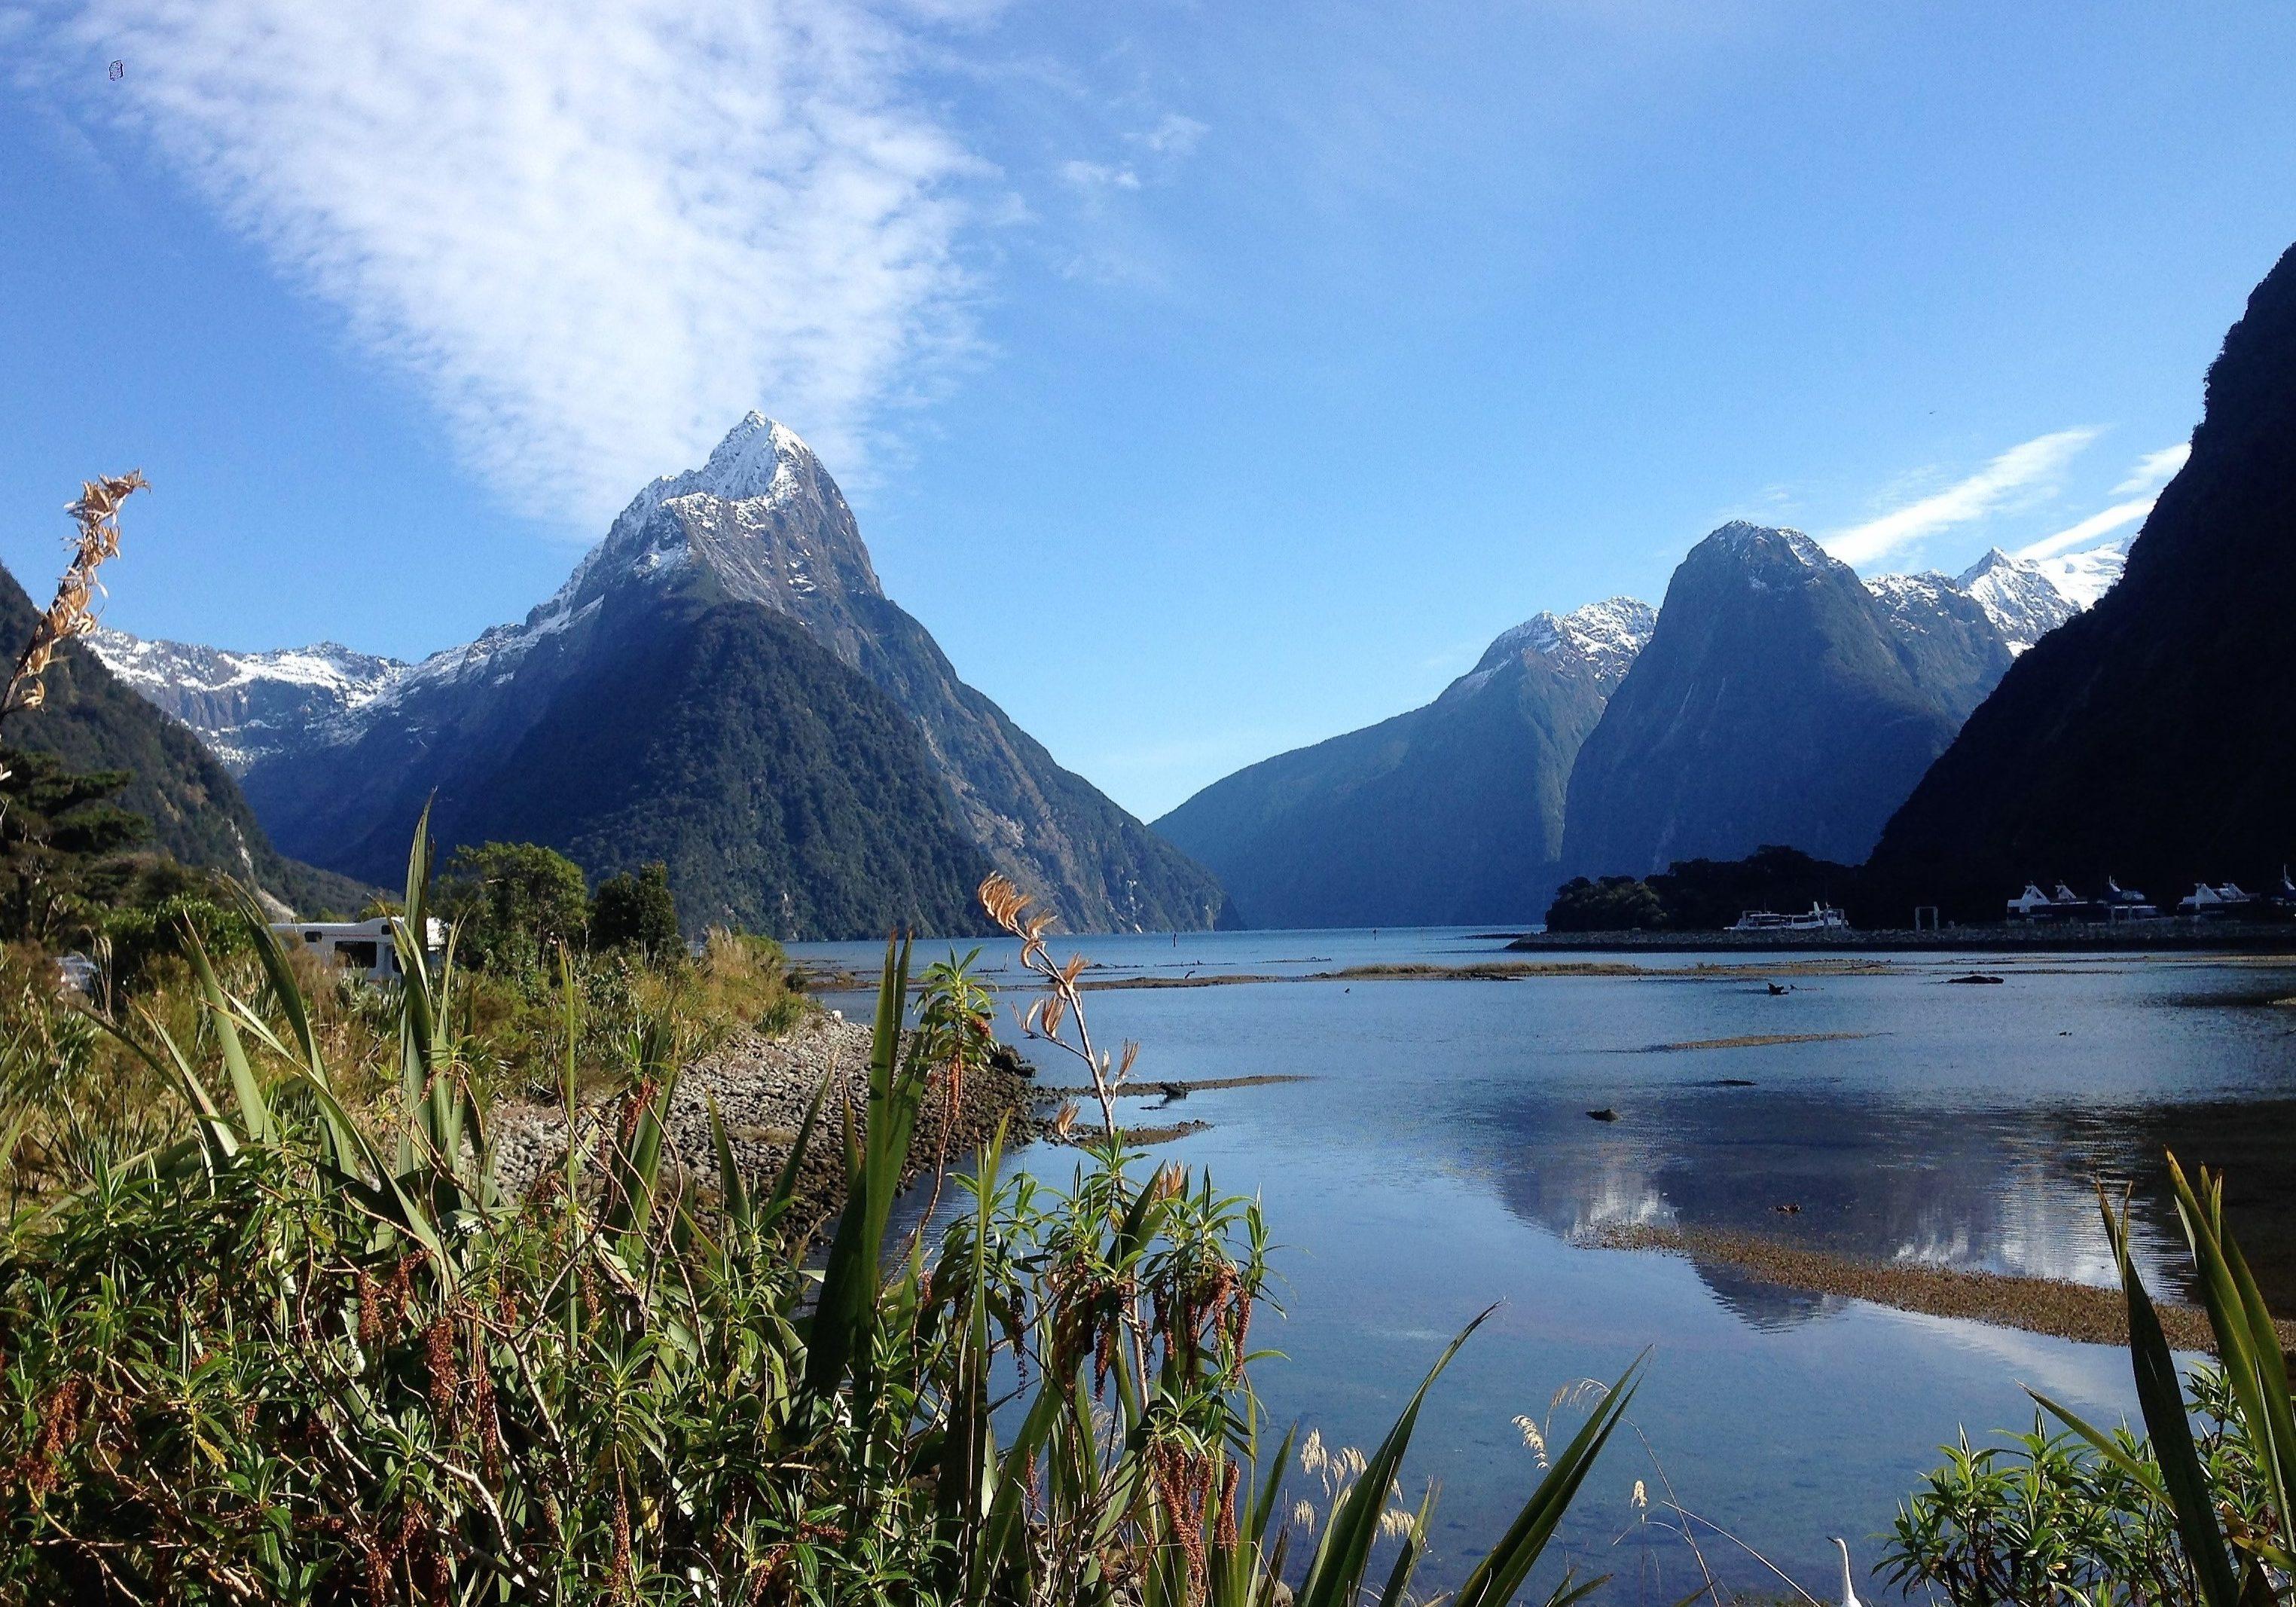 Milford Sound, crusie, fiord, sound, New Zealand, south island